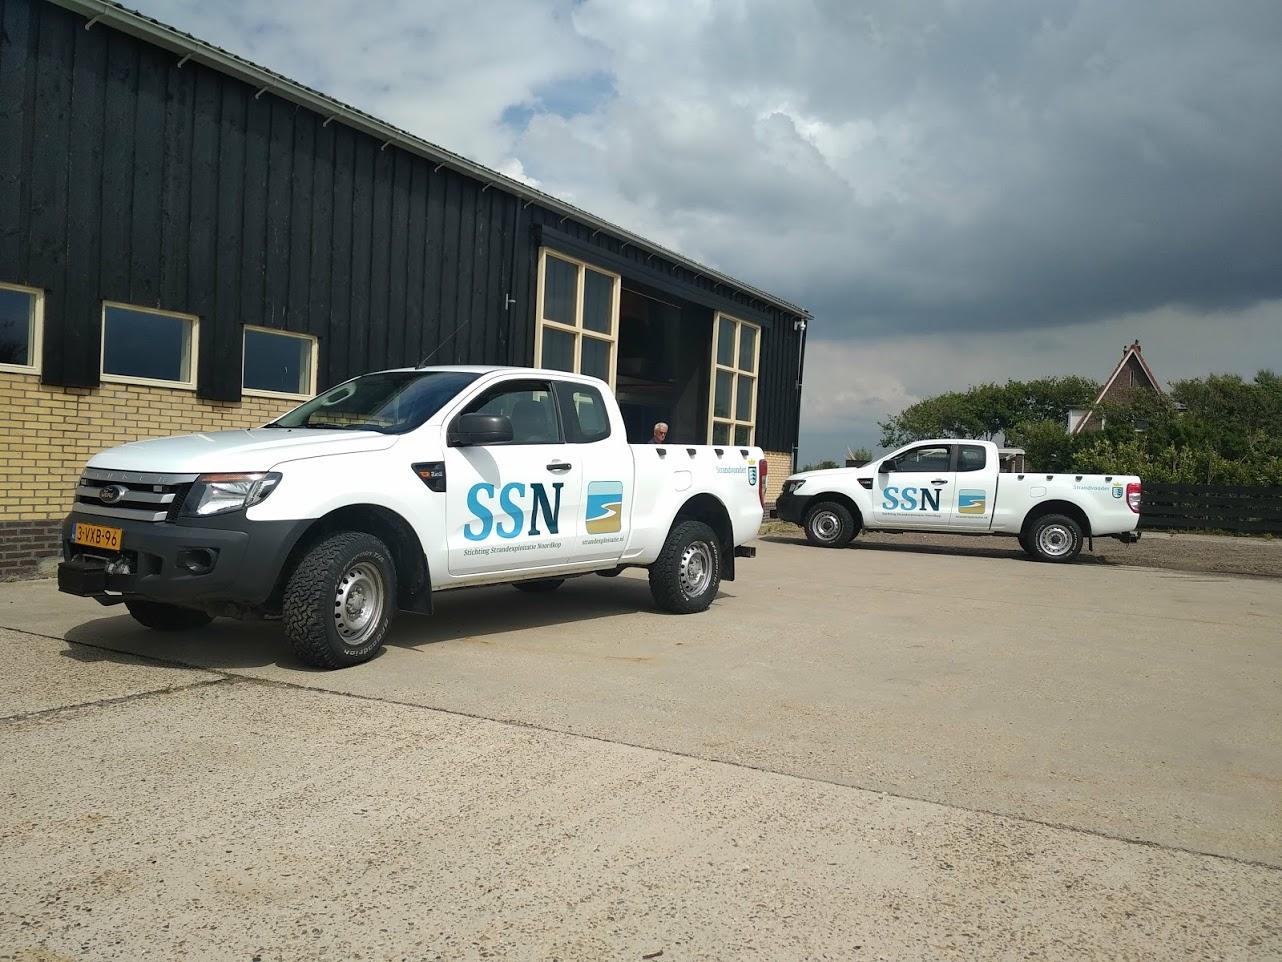 Samenwerking reddingsbrigade en SSN ondertekend